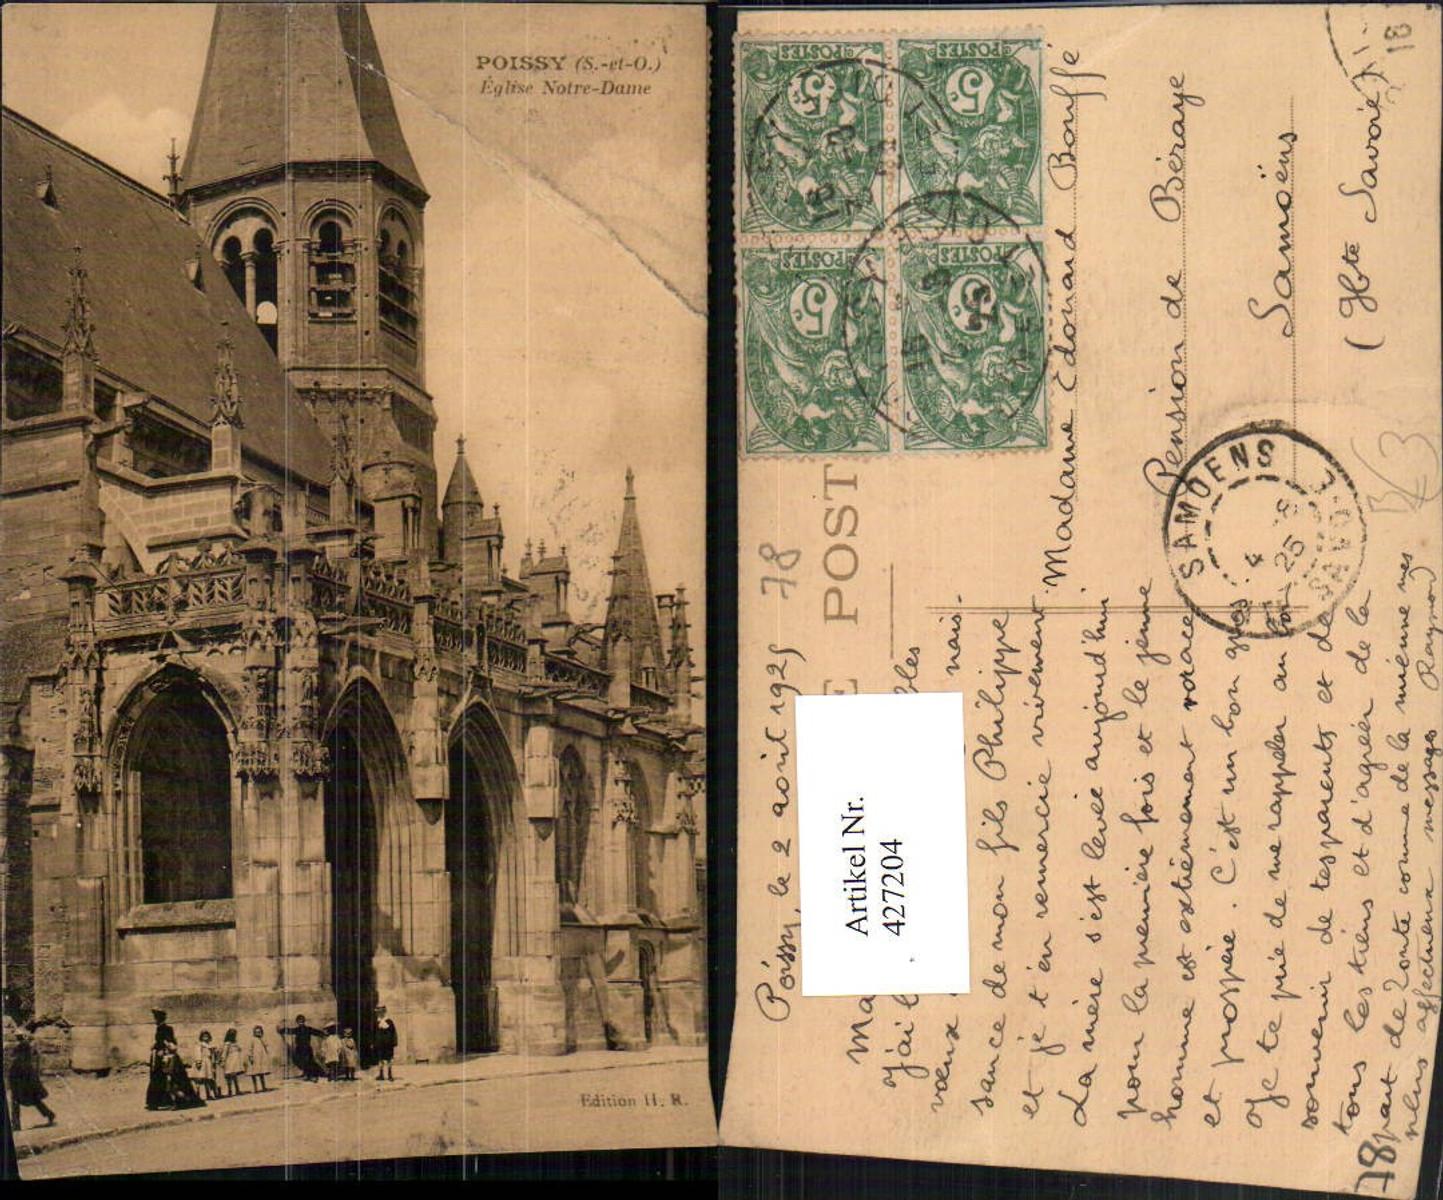 427204,Ile-de-France Yvelines Poissy Eglise Notre-Dame Kirche günstig online kaufen